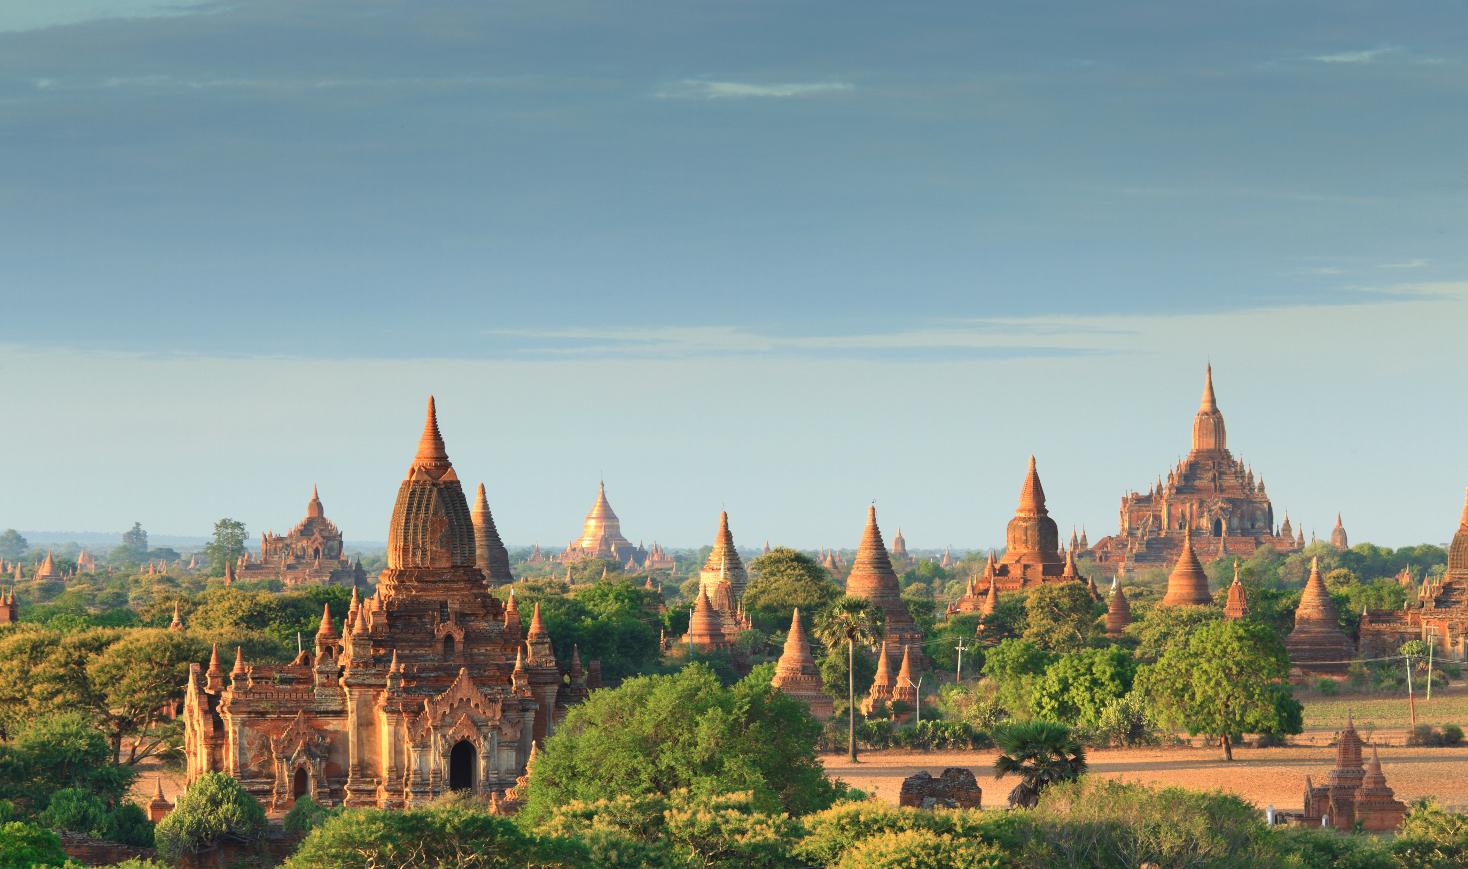 Burma_Bagan_shutterstock_58620745smal